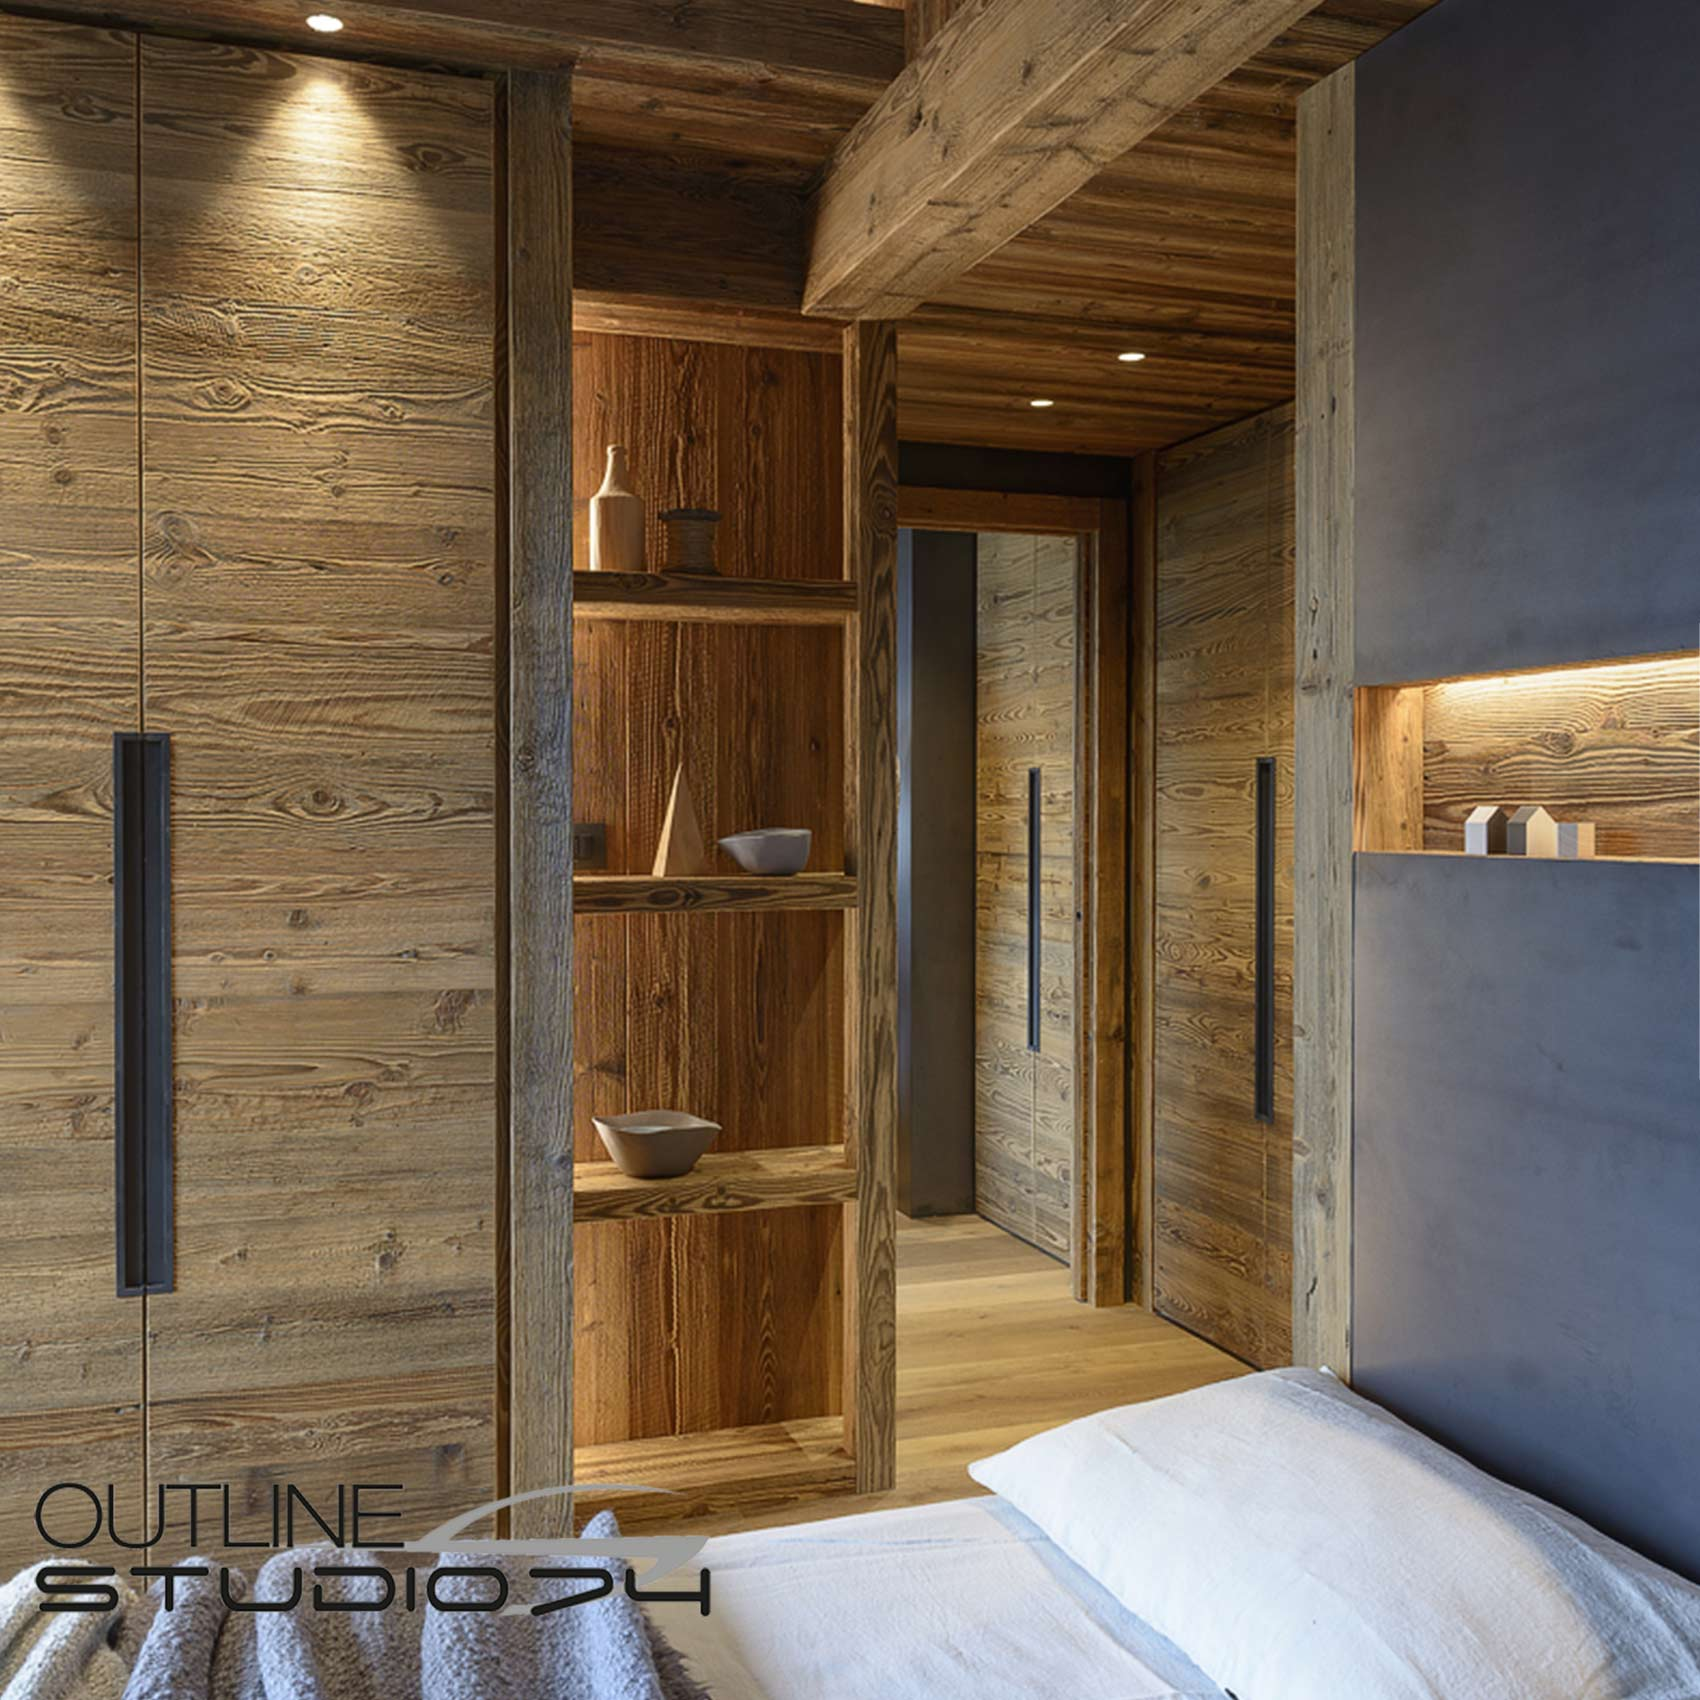 Casa a Cortina - Outline Studio 74